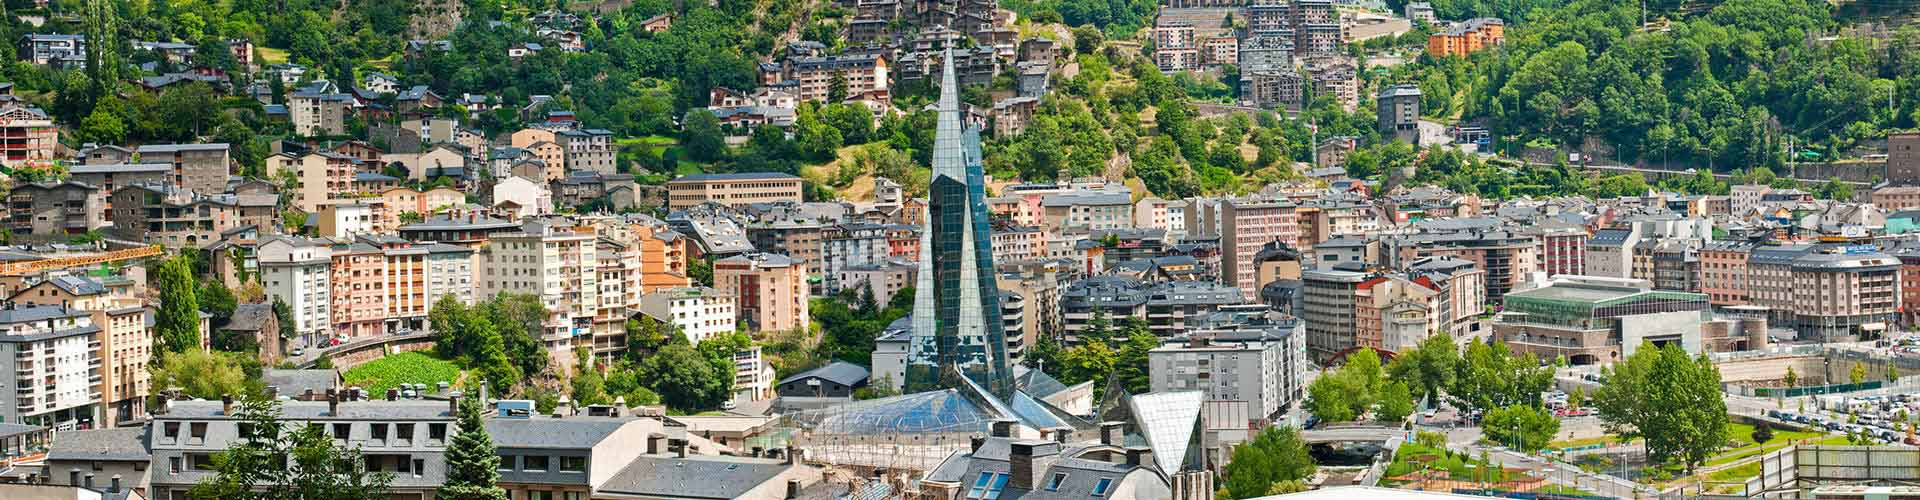 Andorra la Vella - Ubytovny v Andorra la Vella. Mapy pro Andorra la Vella, fotky a recenze pro každý Ubytovnu - Andorra la Vella.